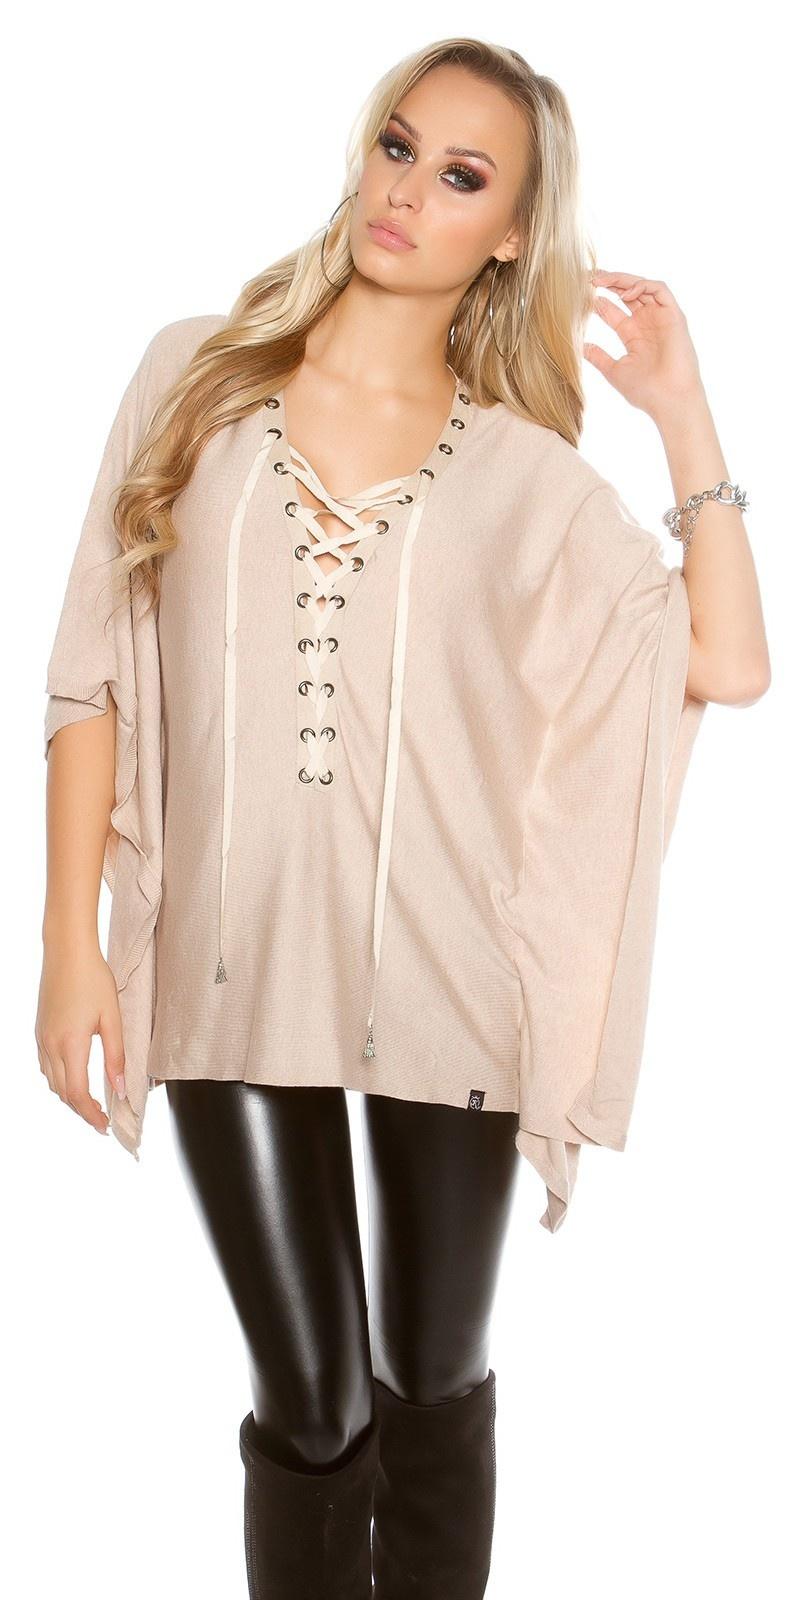 Trendy vleermuis - poncho look trui beige